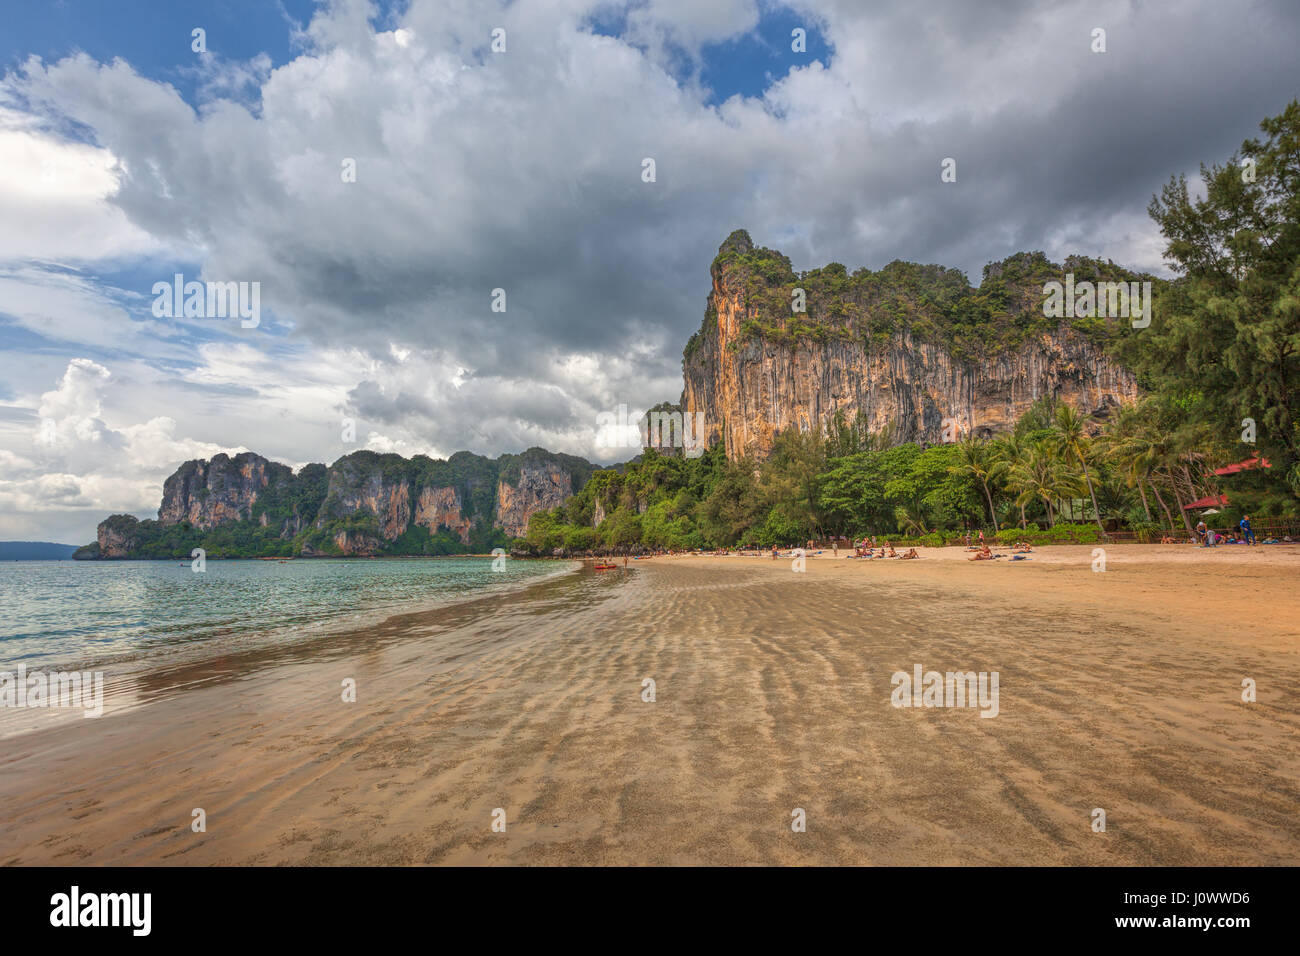 Railay Beach, Ao Nang, Krabi province, Thailand, Southeast Asia - Stock Image